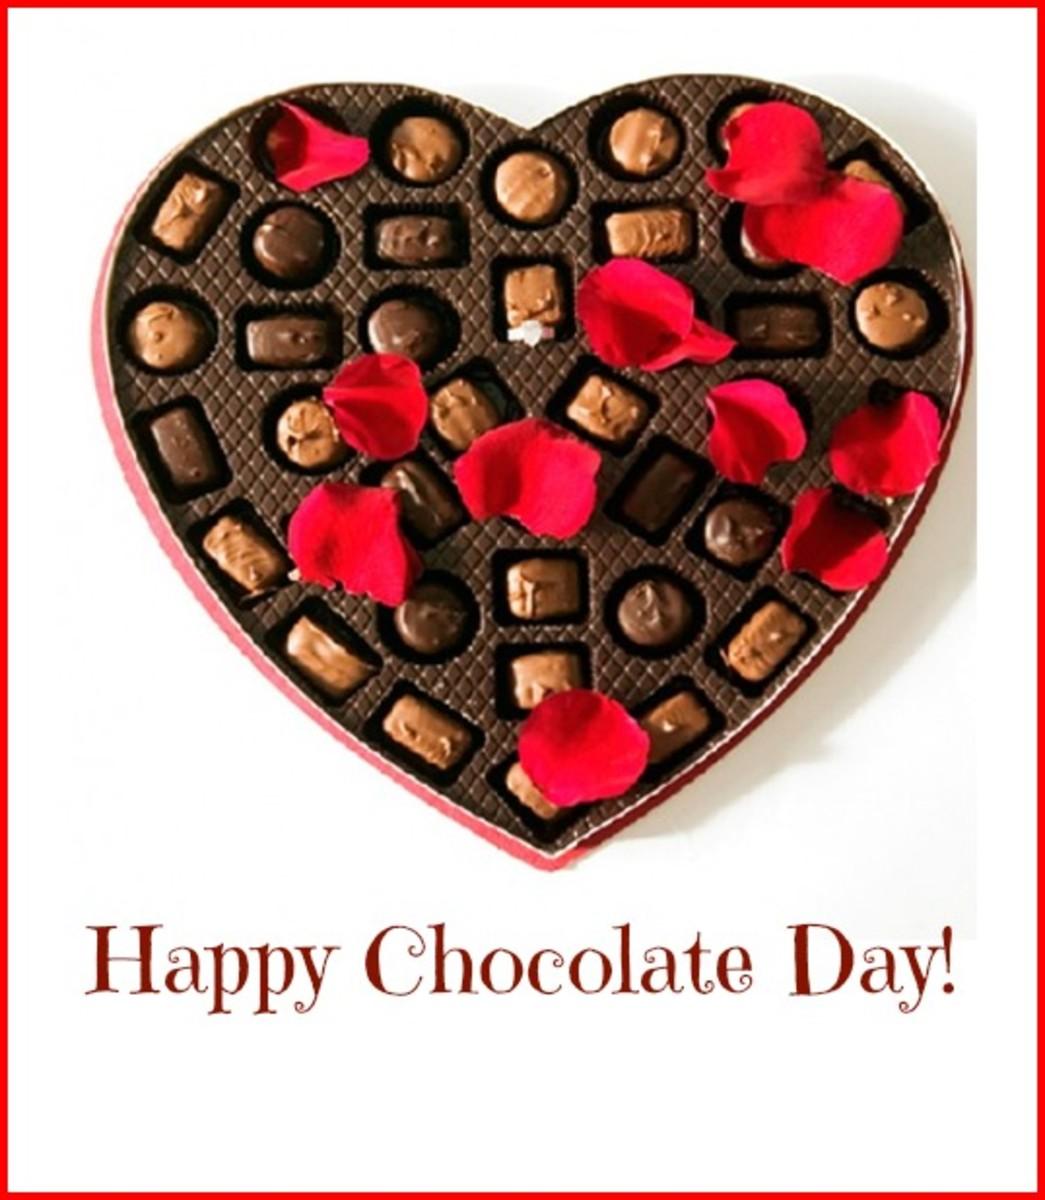 Happy Chocolate Day Valentine